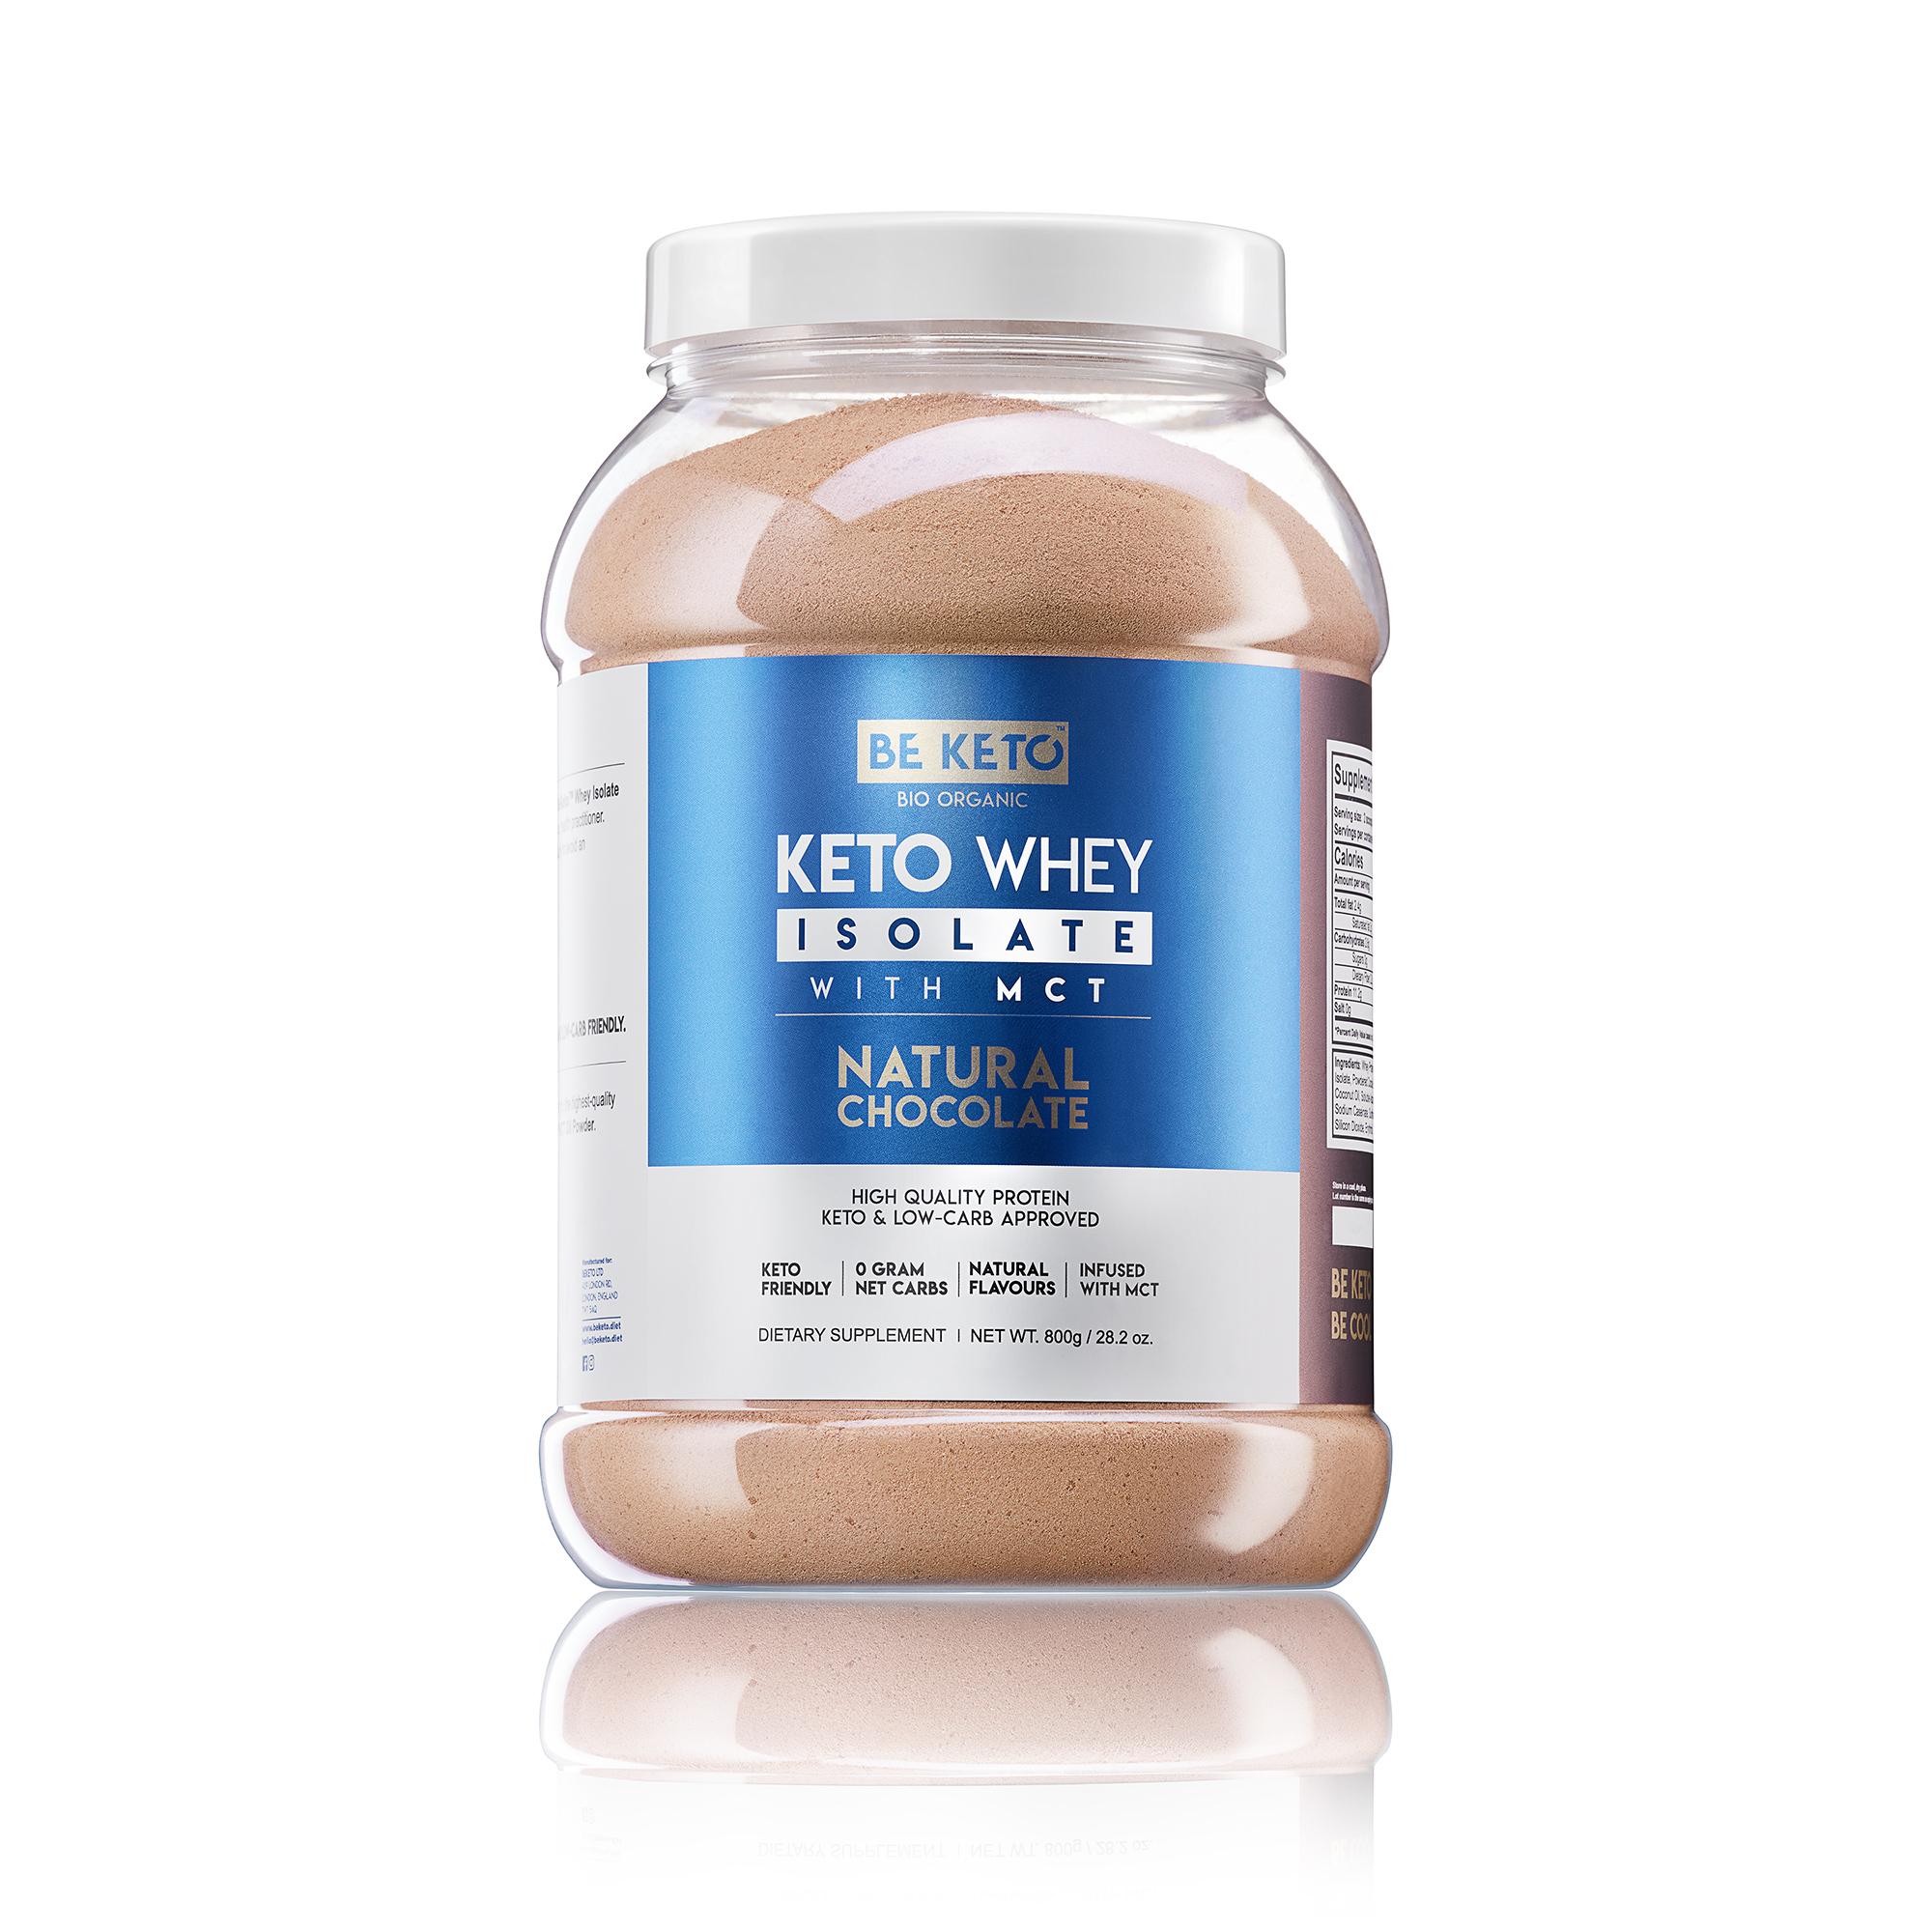 Keto Whey isolate + MCT - Natural Chocolate 800G